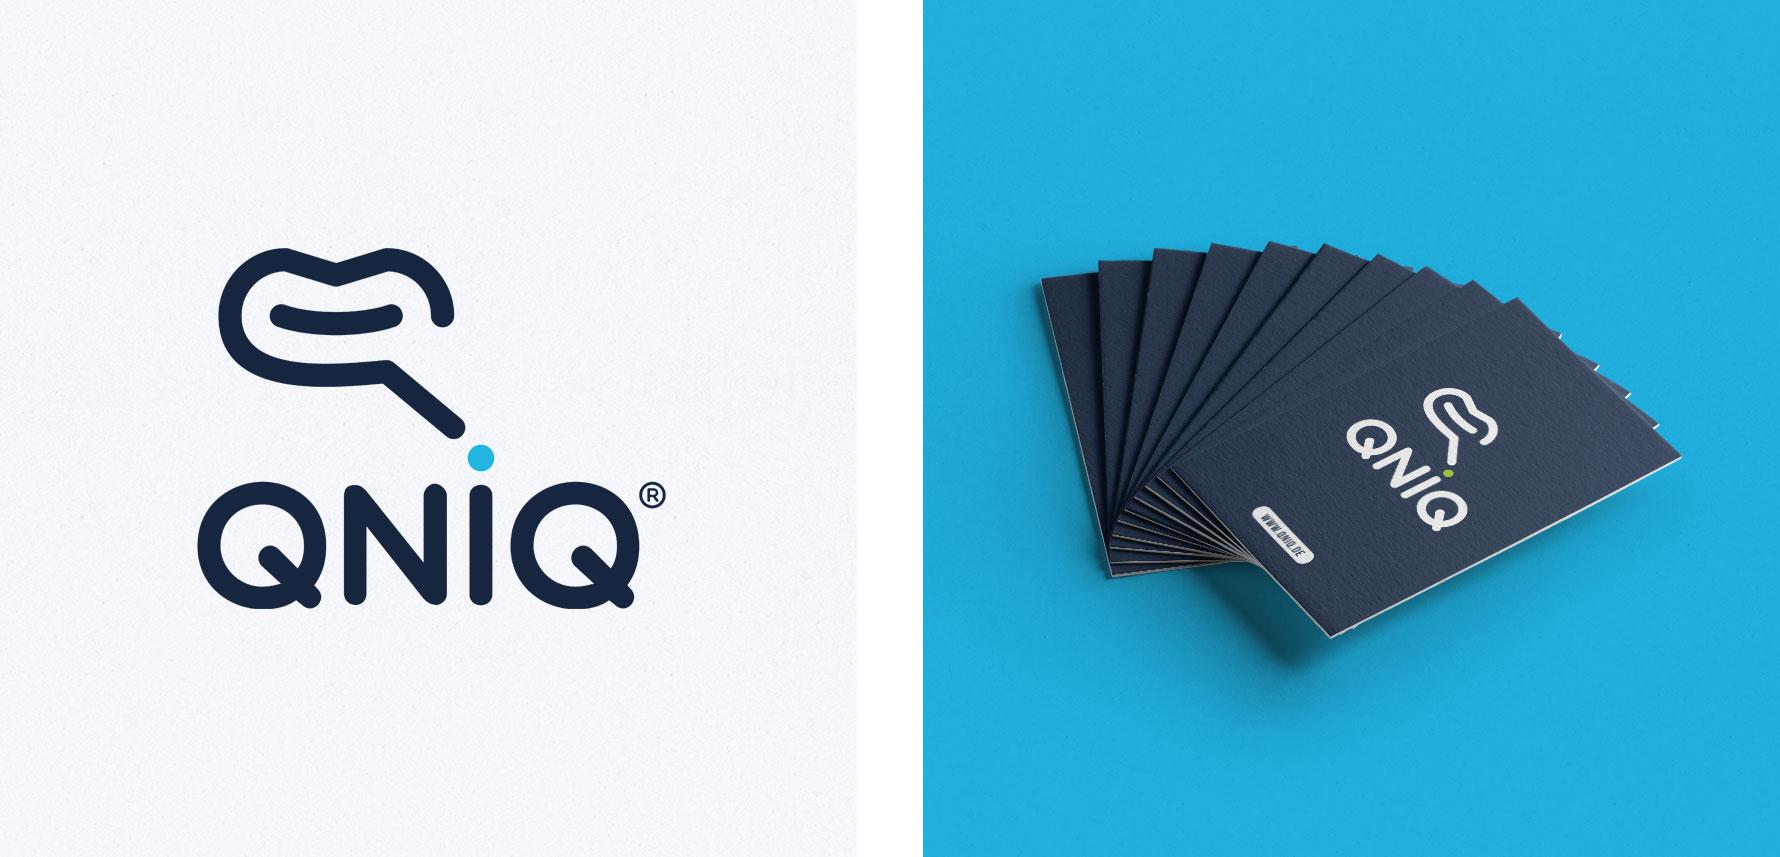 Hüfner Design | Referenz QNIQ | Logo Design | Business Card